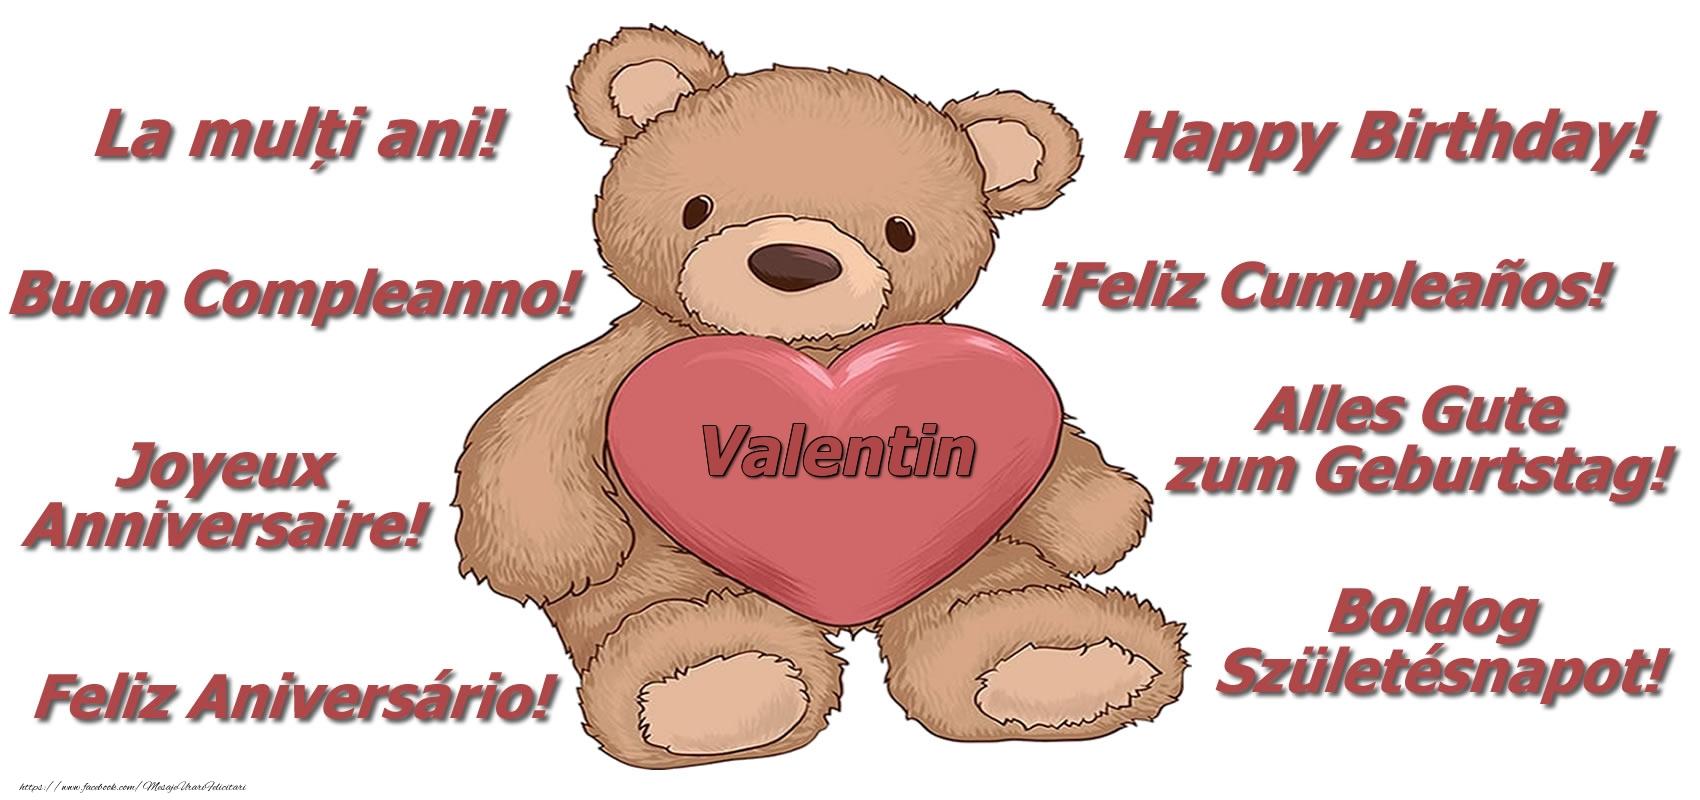 Felicitari de zi de nastere - La multi ani Valentin! - Ursulet